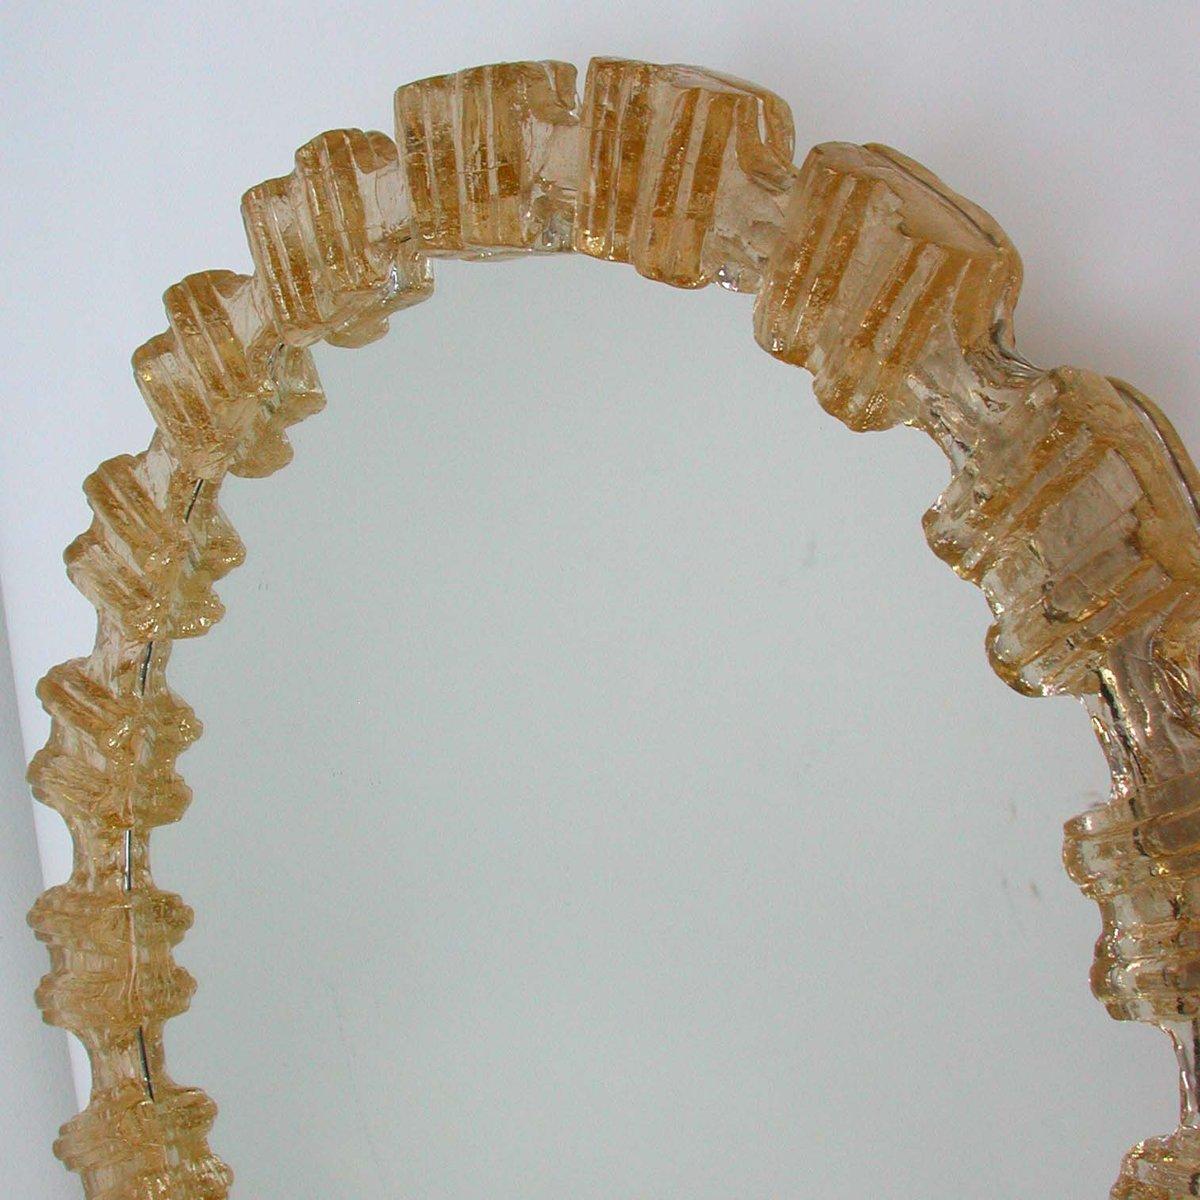 Miroir r tro clair nos mid century en verre givr ambr - Miroir retro eclaire ...